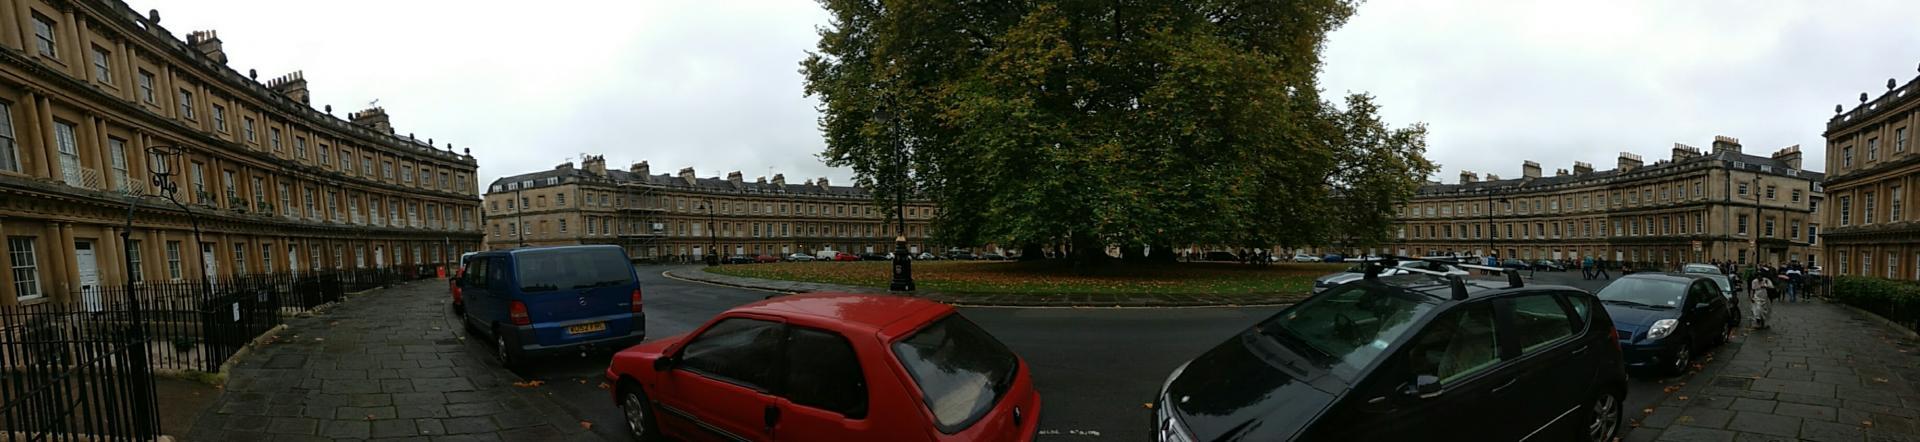 The Circus, Bath - November 2016